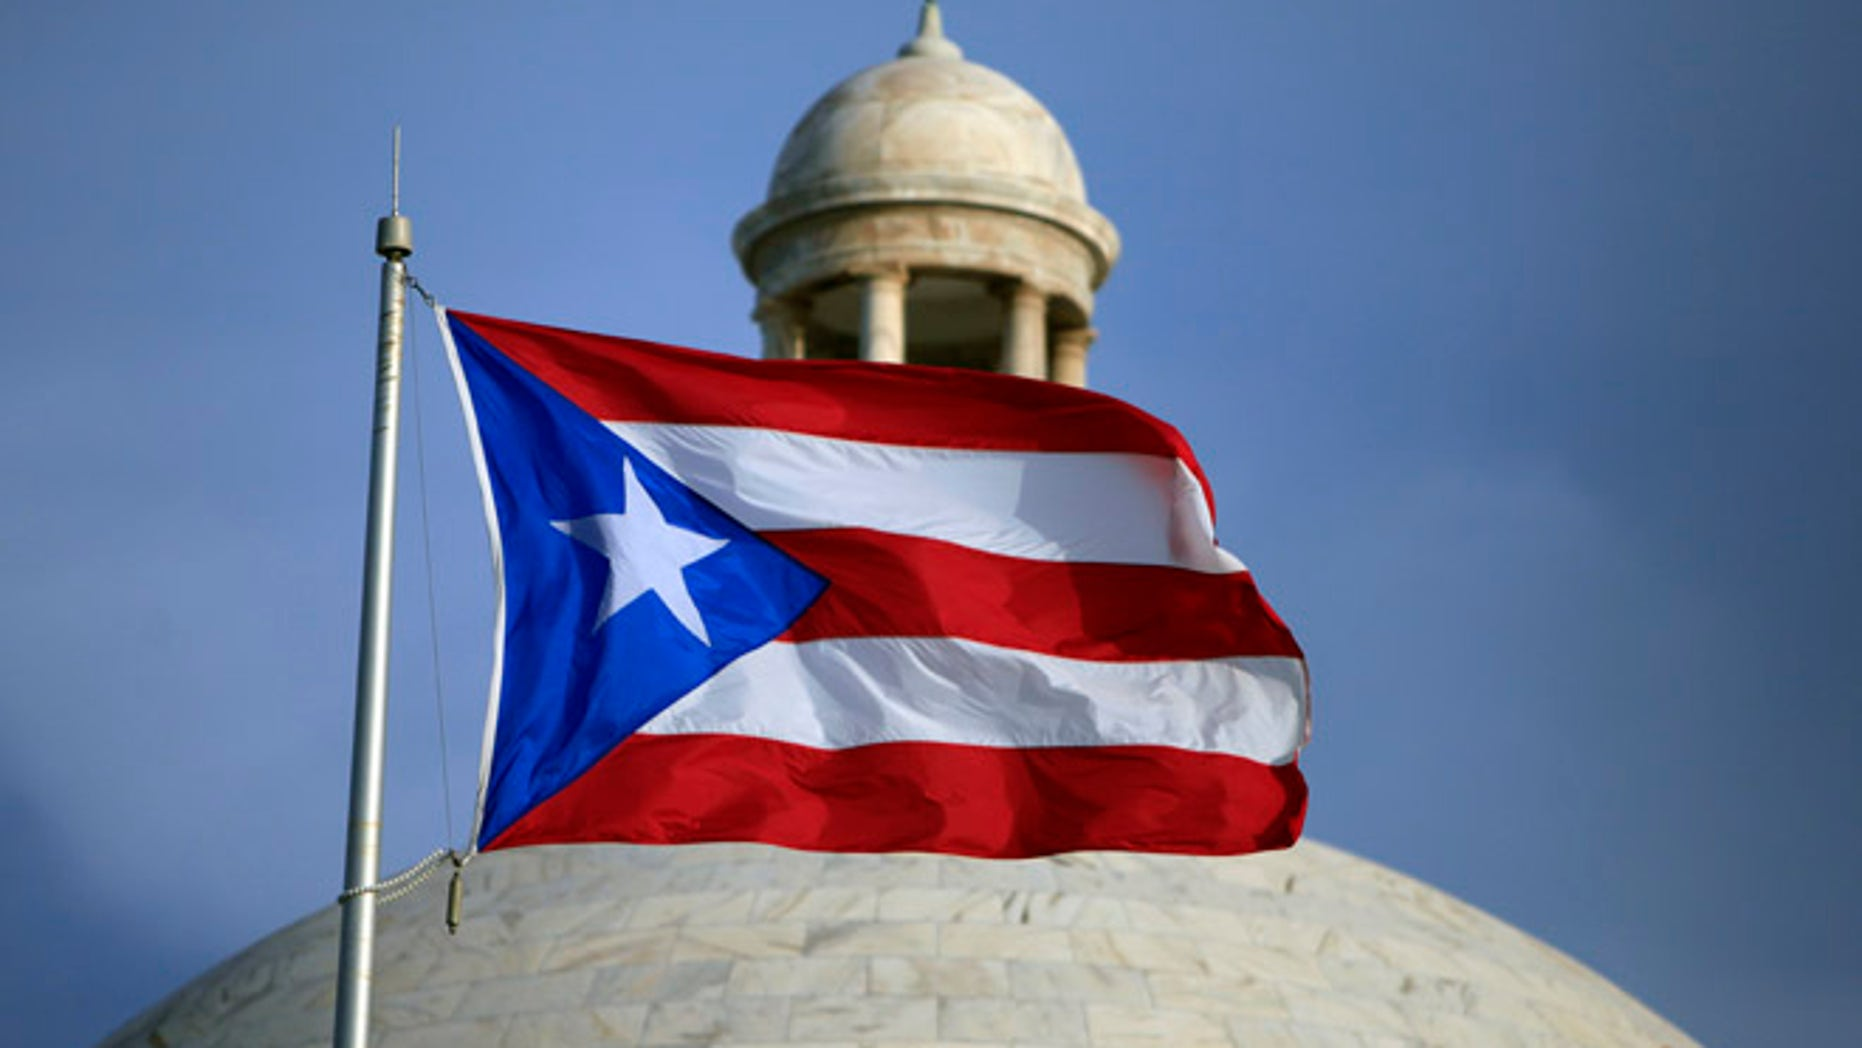 In this July 29, 2015 file photo, the Puerto Rican flag flies in San Juan.